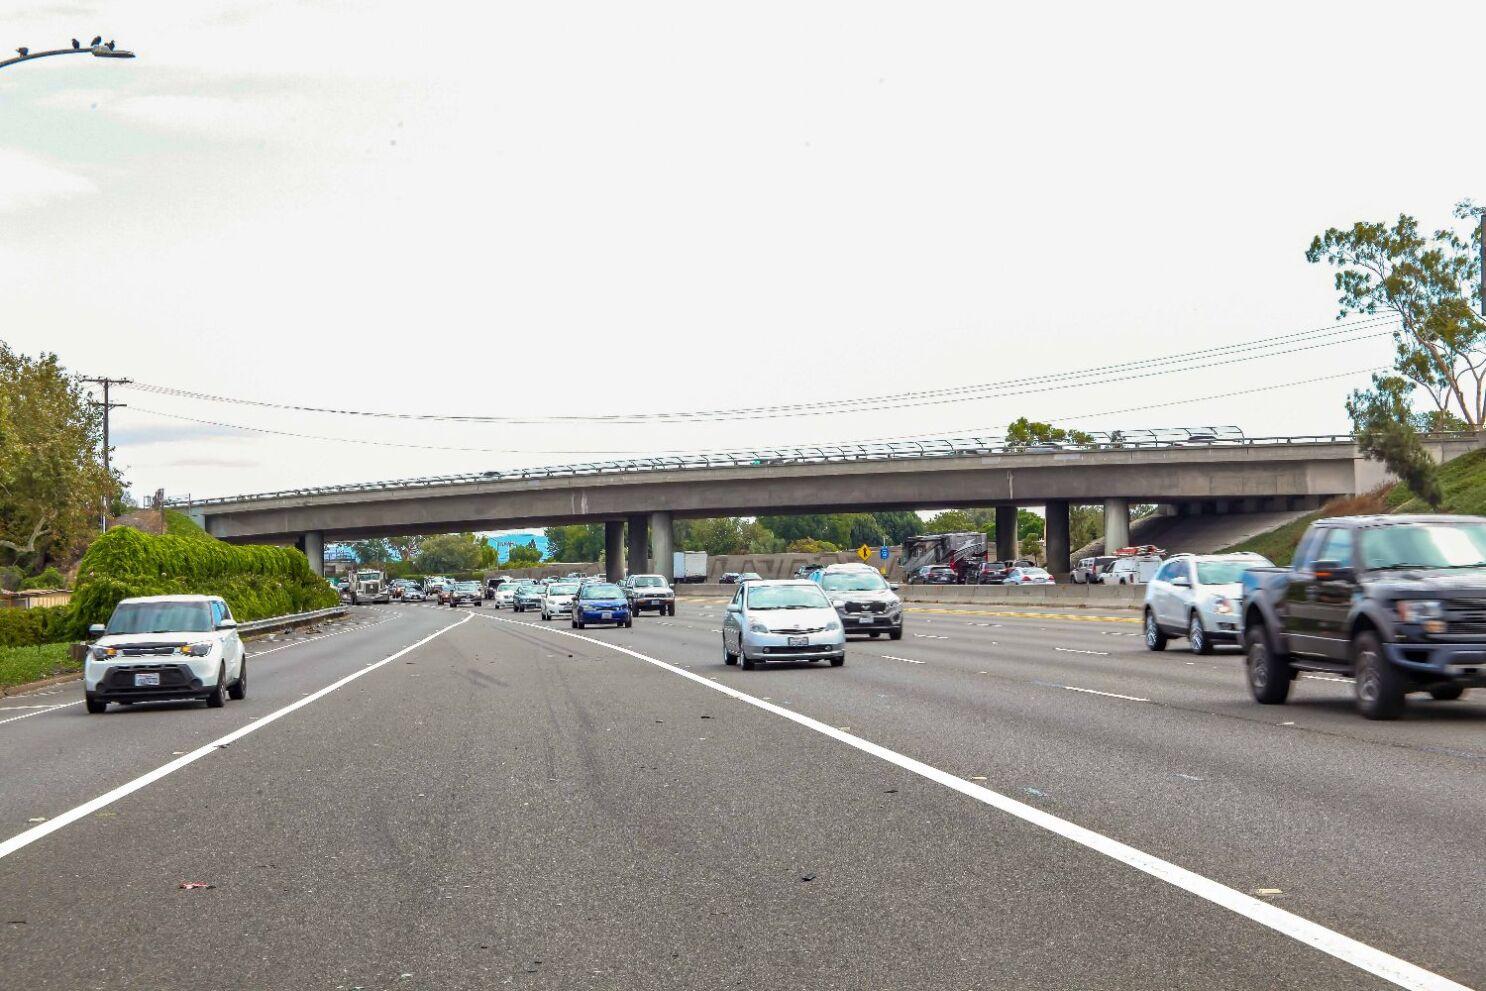 Talbert Avenue bridge over 405 Freeway to be demolished